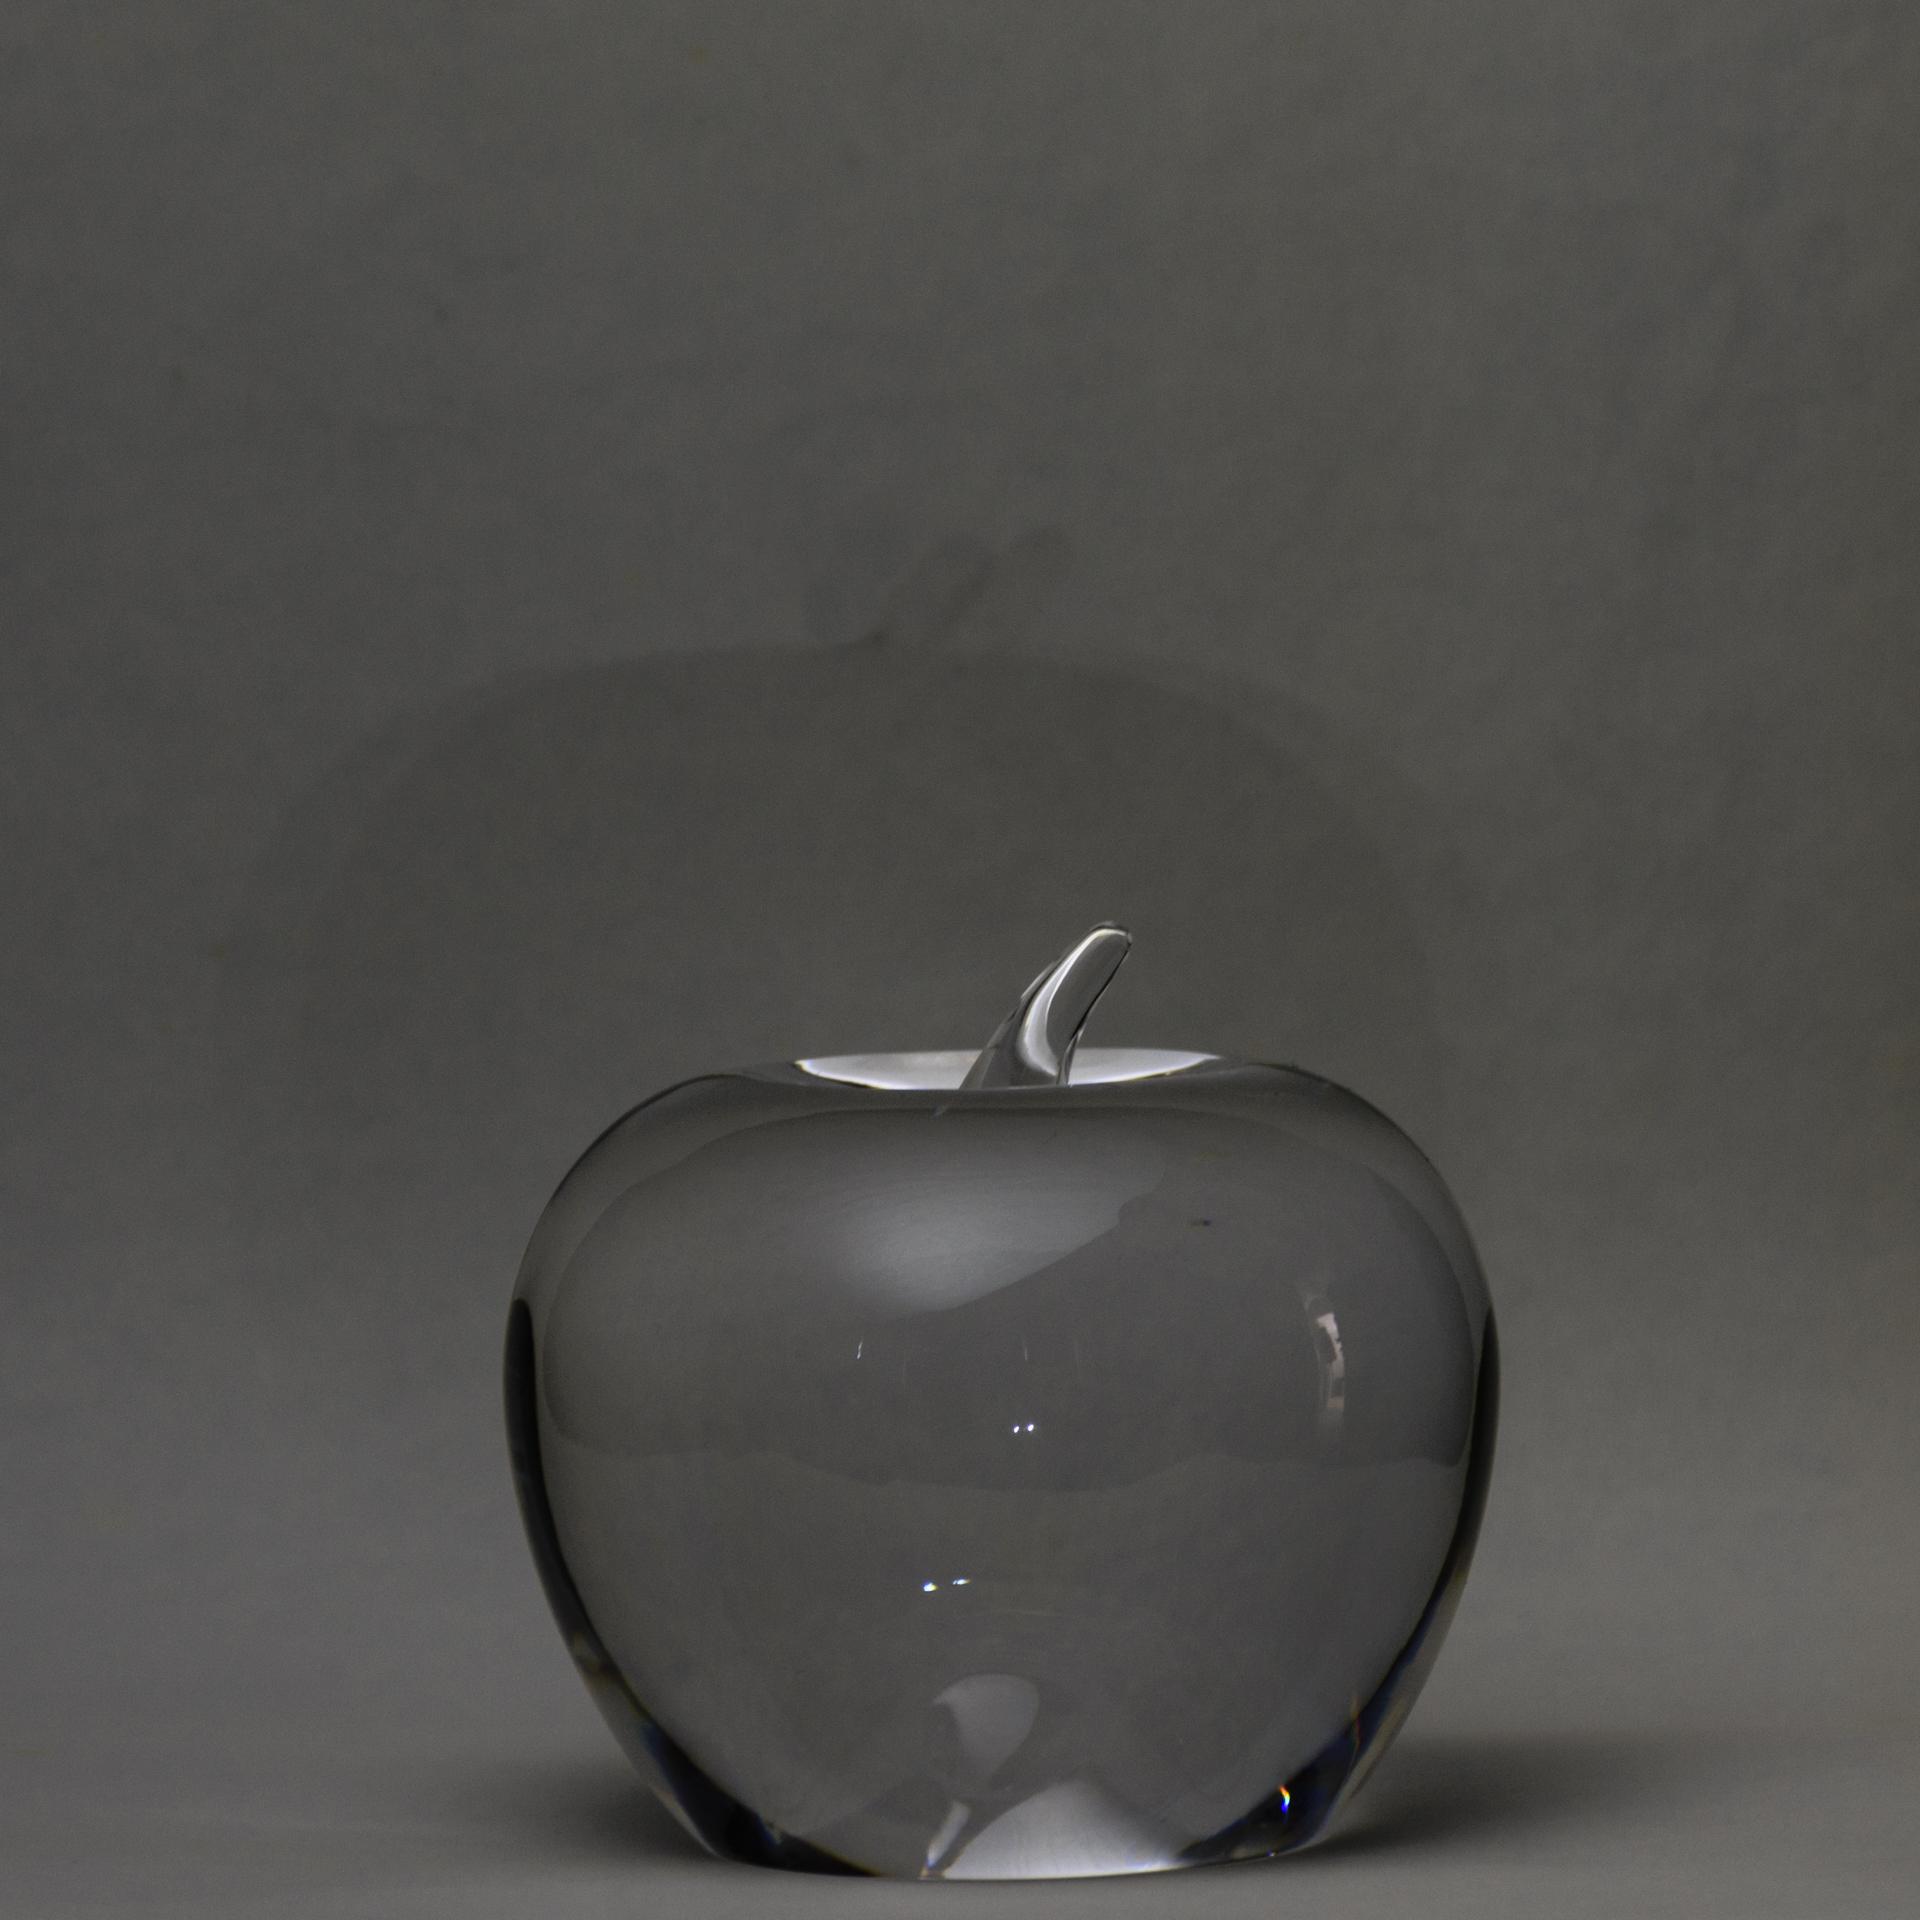 #1 Crystal Apple 1.jpg